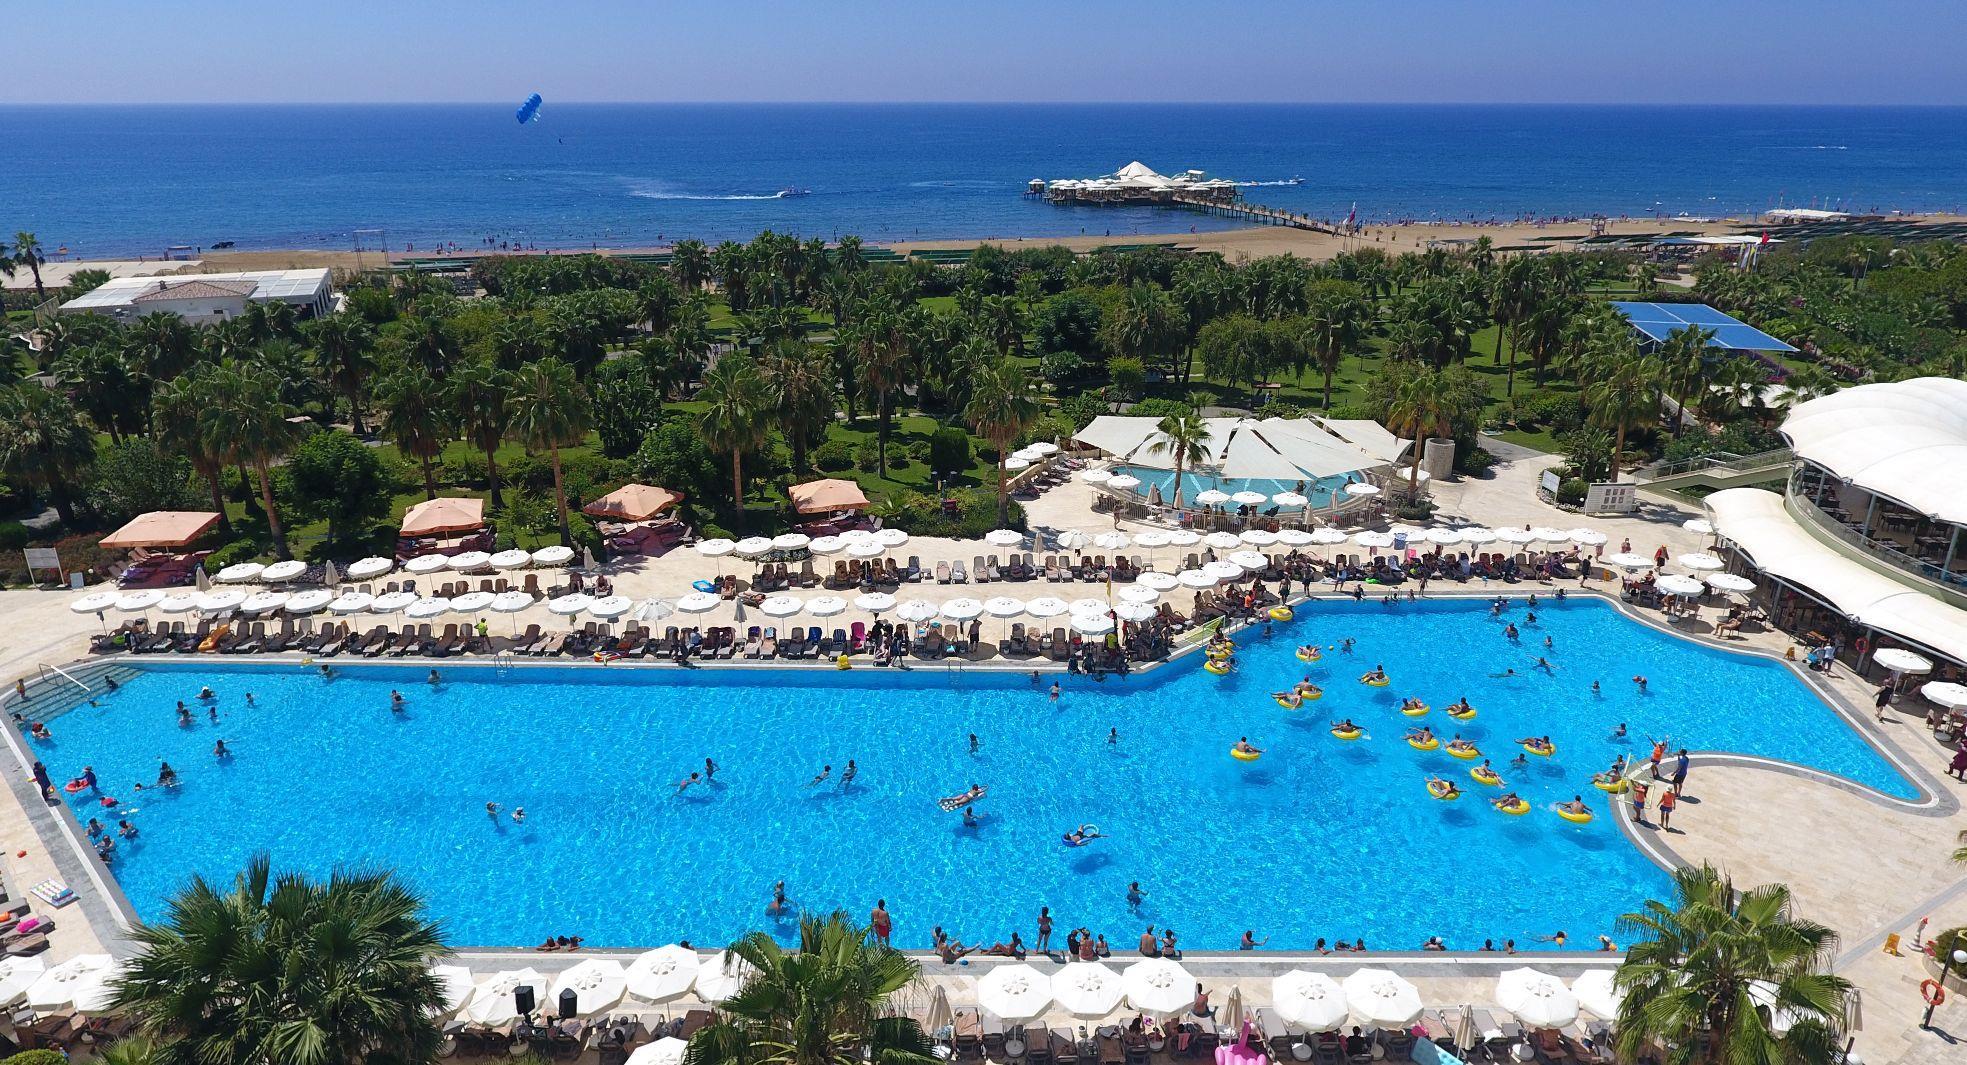 http://www.orextravel.sk/OREX/hotelphotos/vonresort-golden-coast-general-0039.jpg